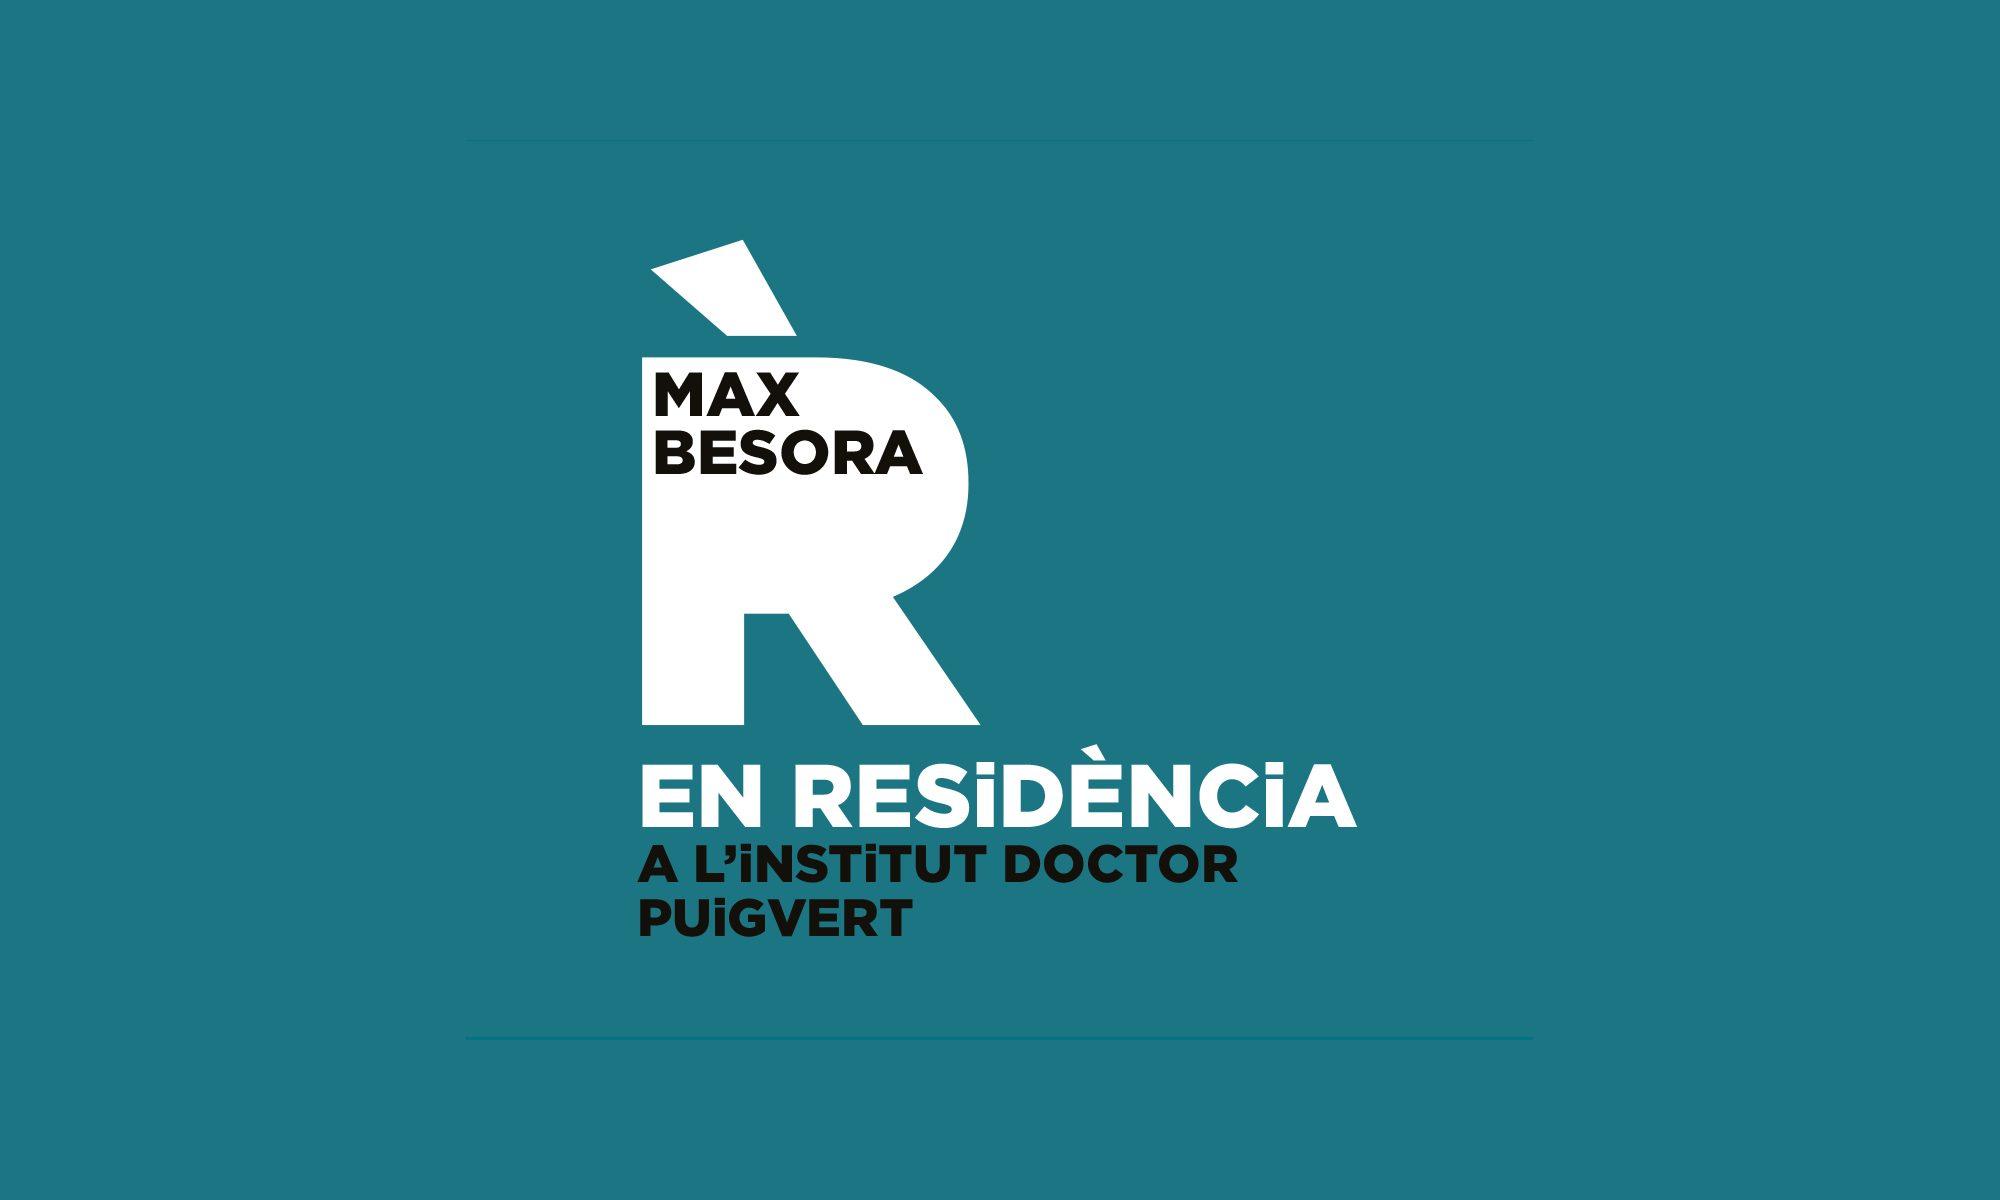 Max Besora EN RESiDÈNCiA